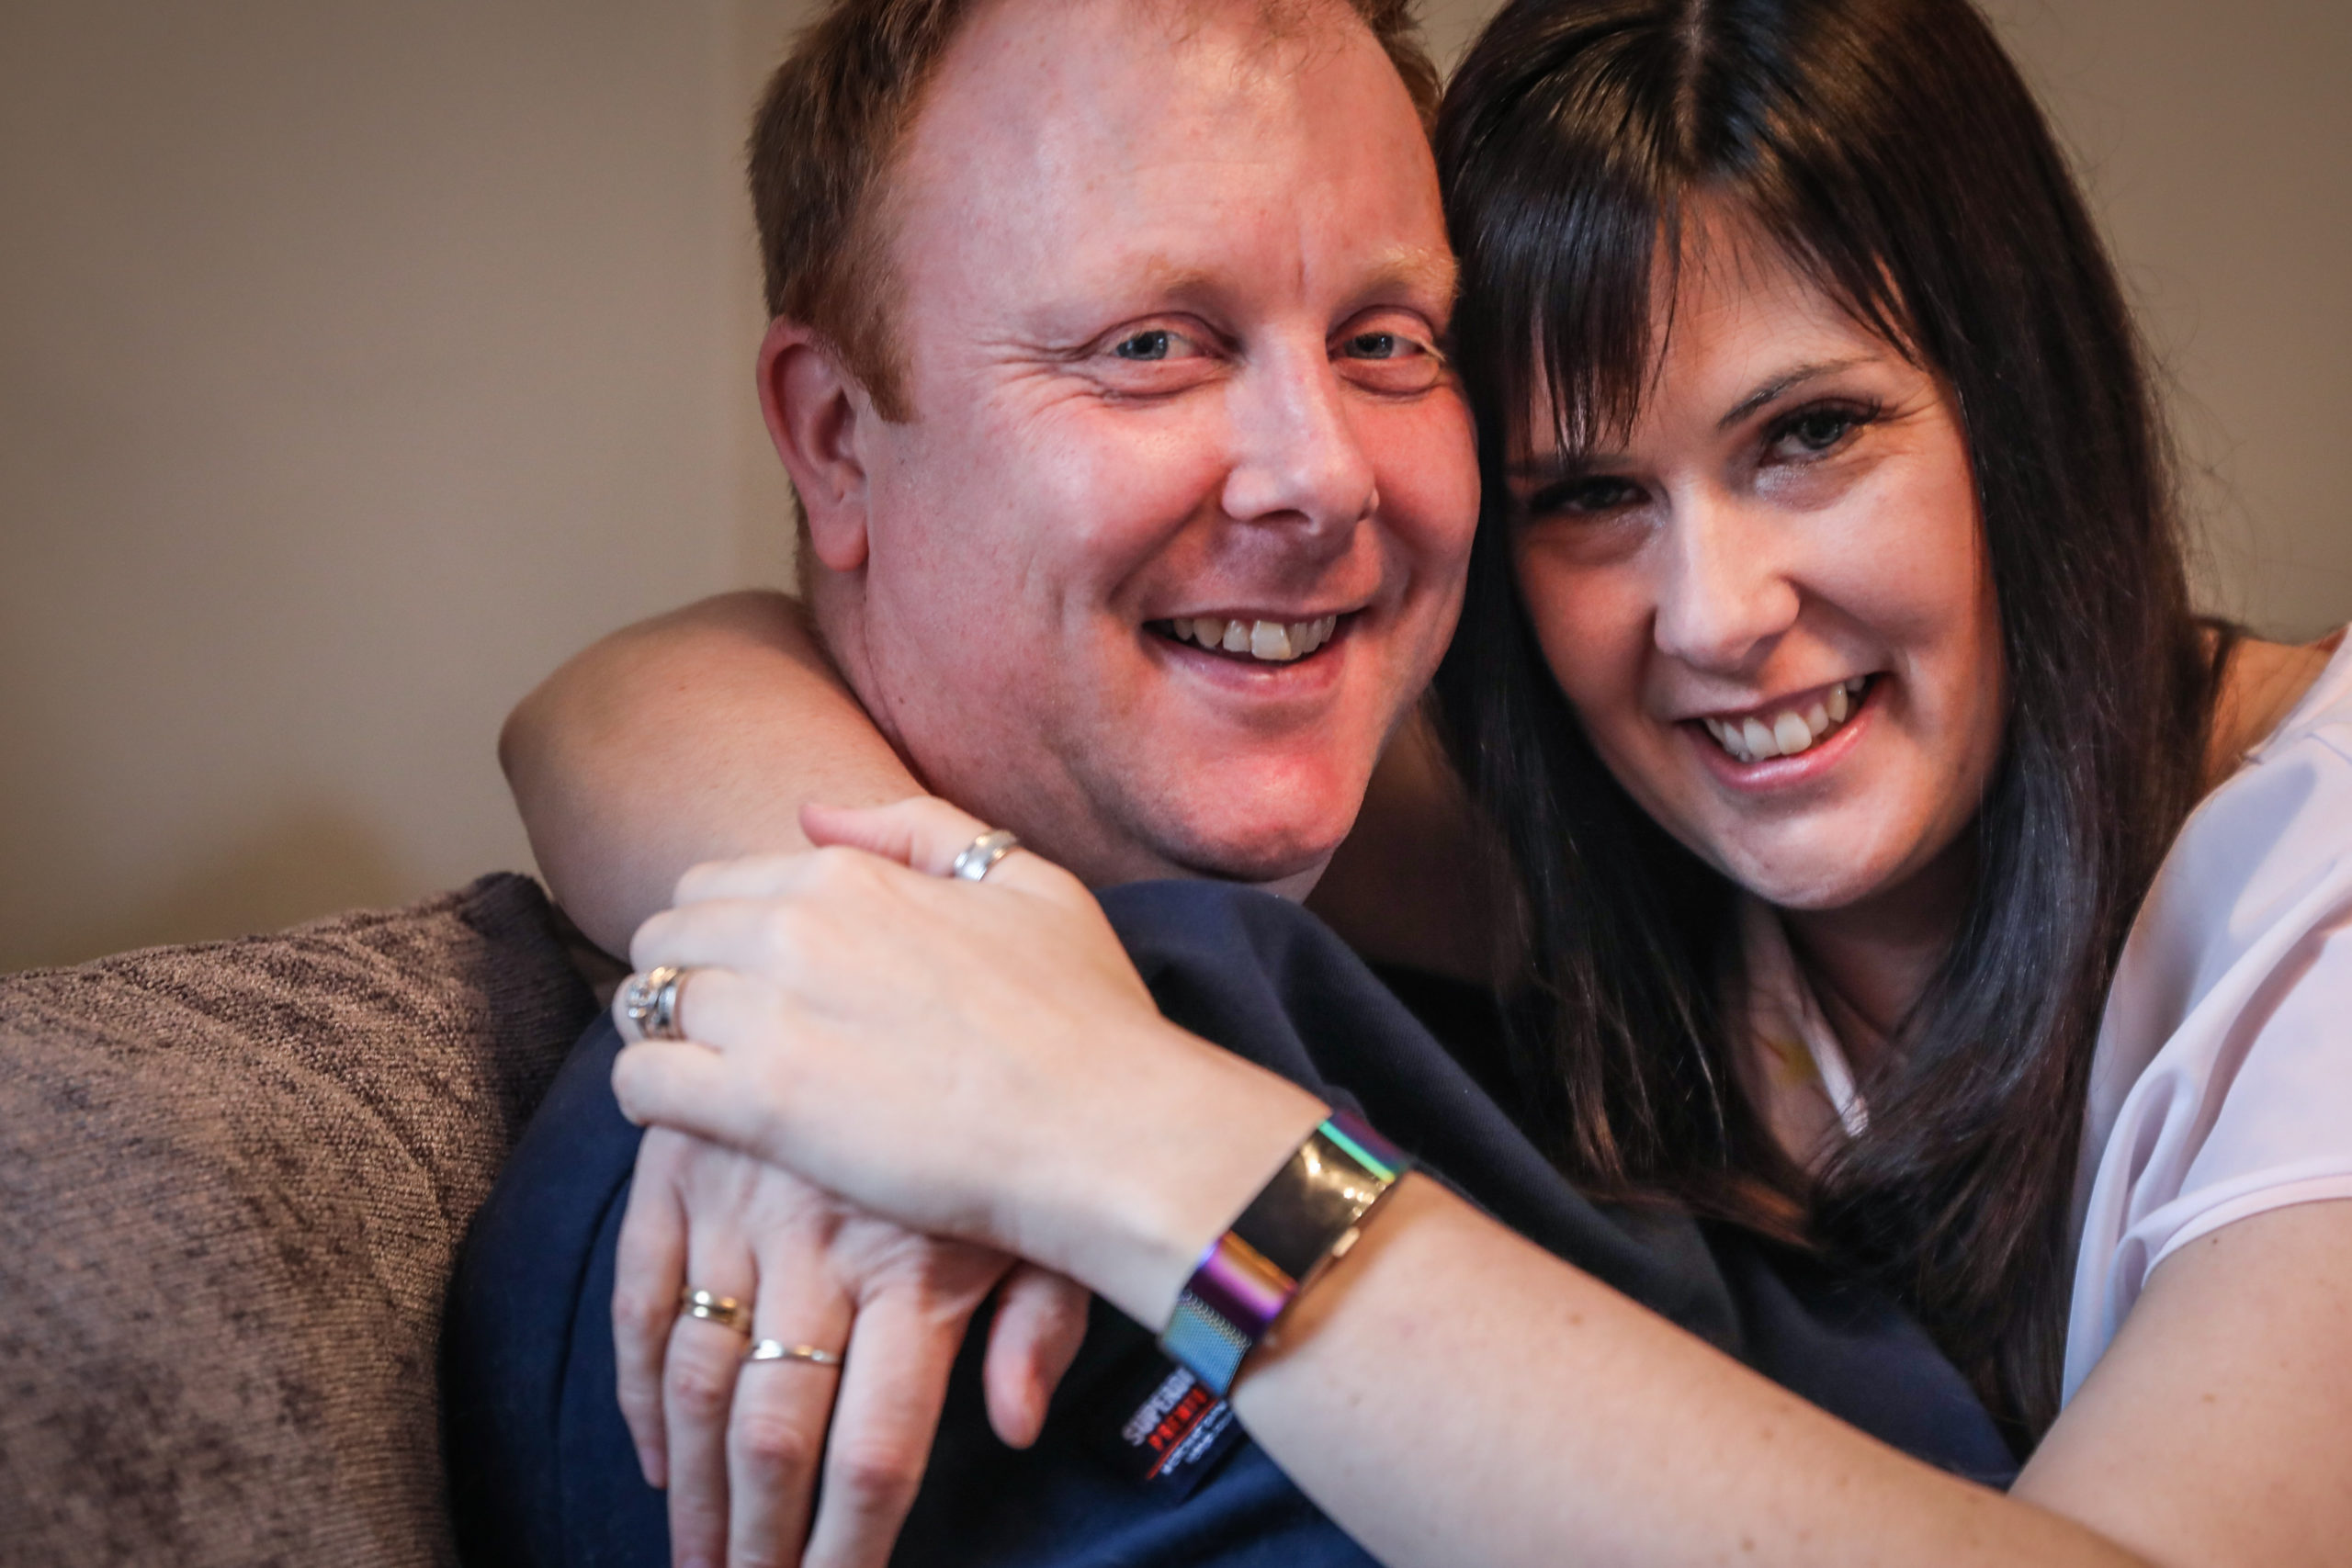 Christine proposed to Alan Kirk live on camera for STV.